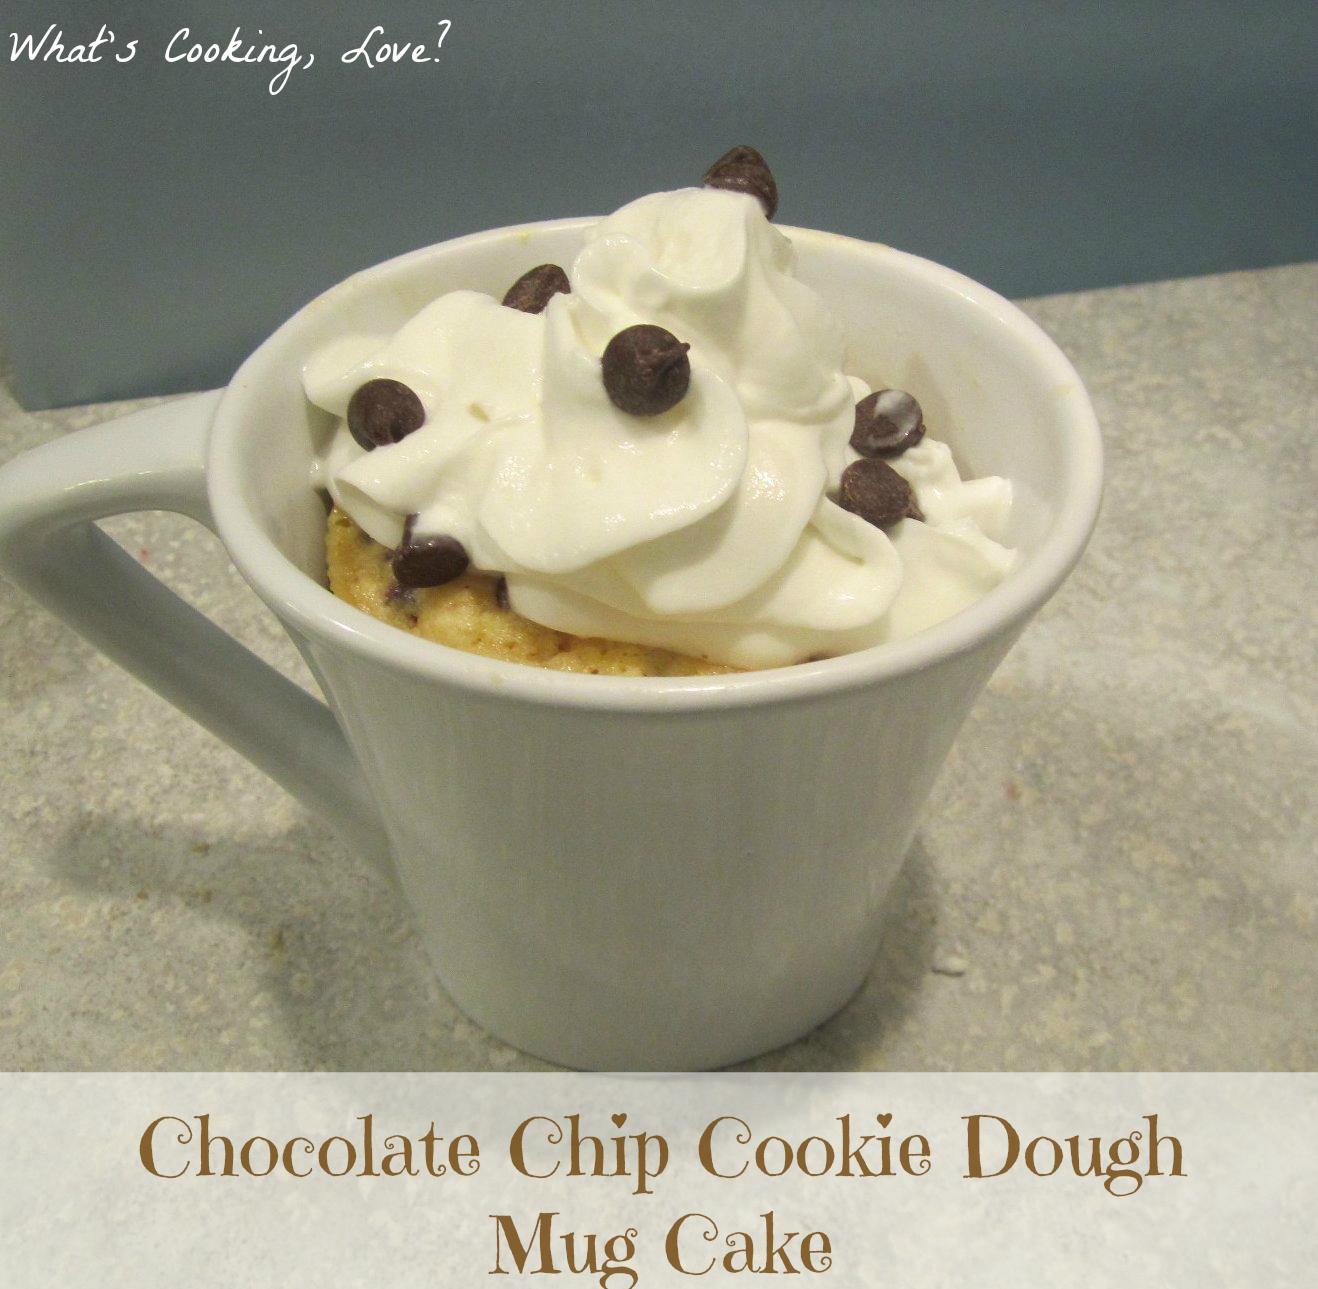 Chocolate Chip Cookie Dough Mug Cake Whats Cooking Love